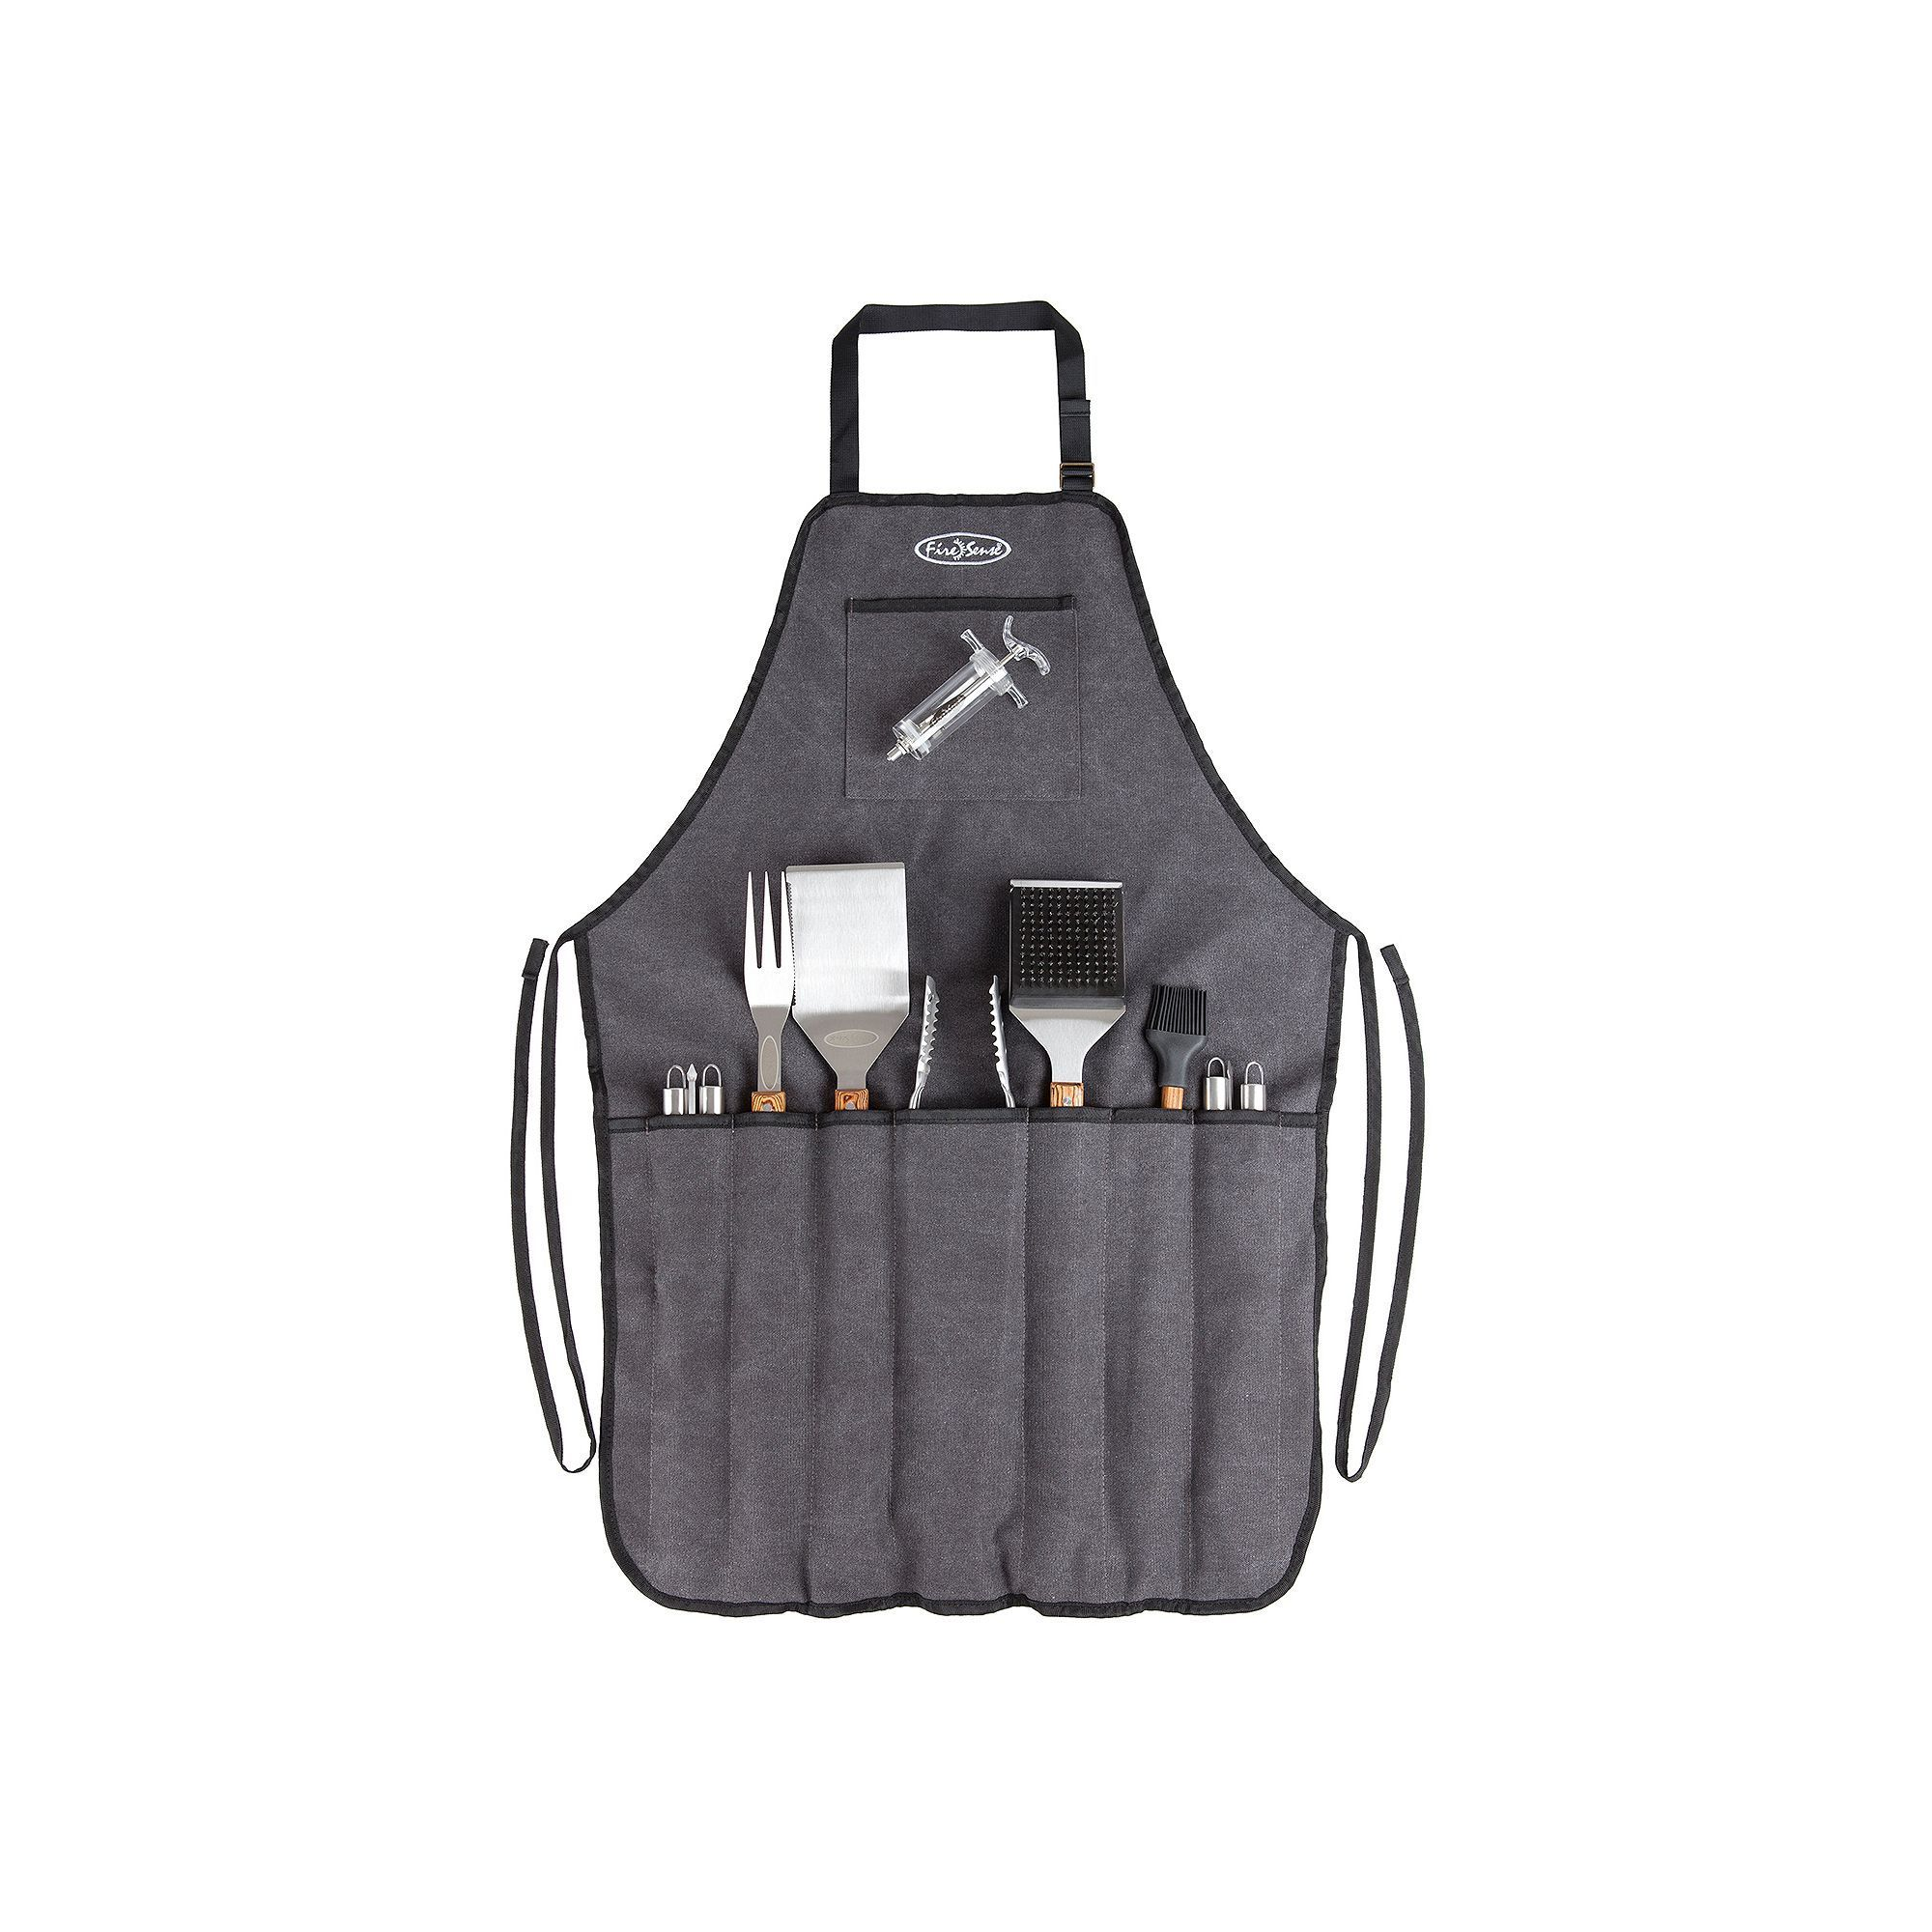 fire sense elite stainless steel bbq tool u0026 apron set tool apron